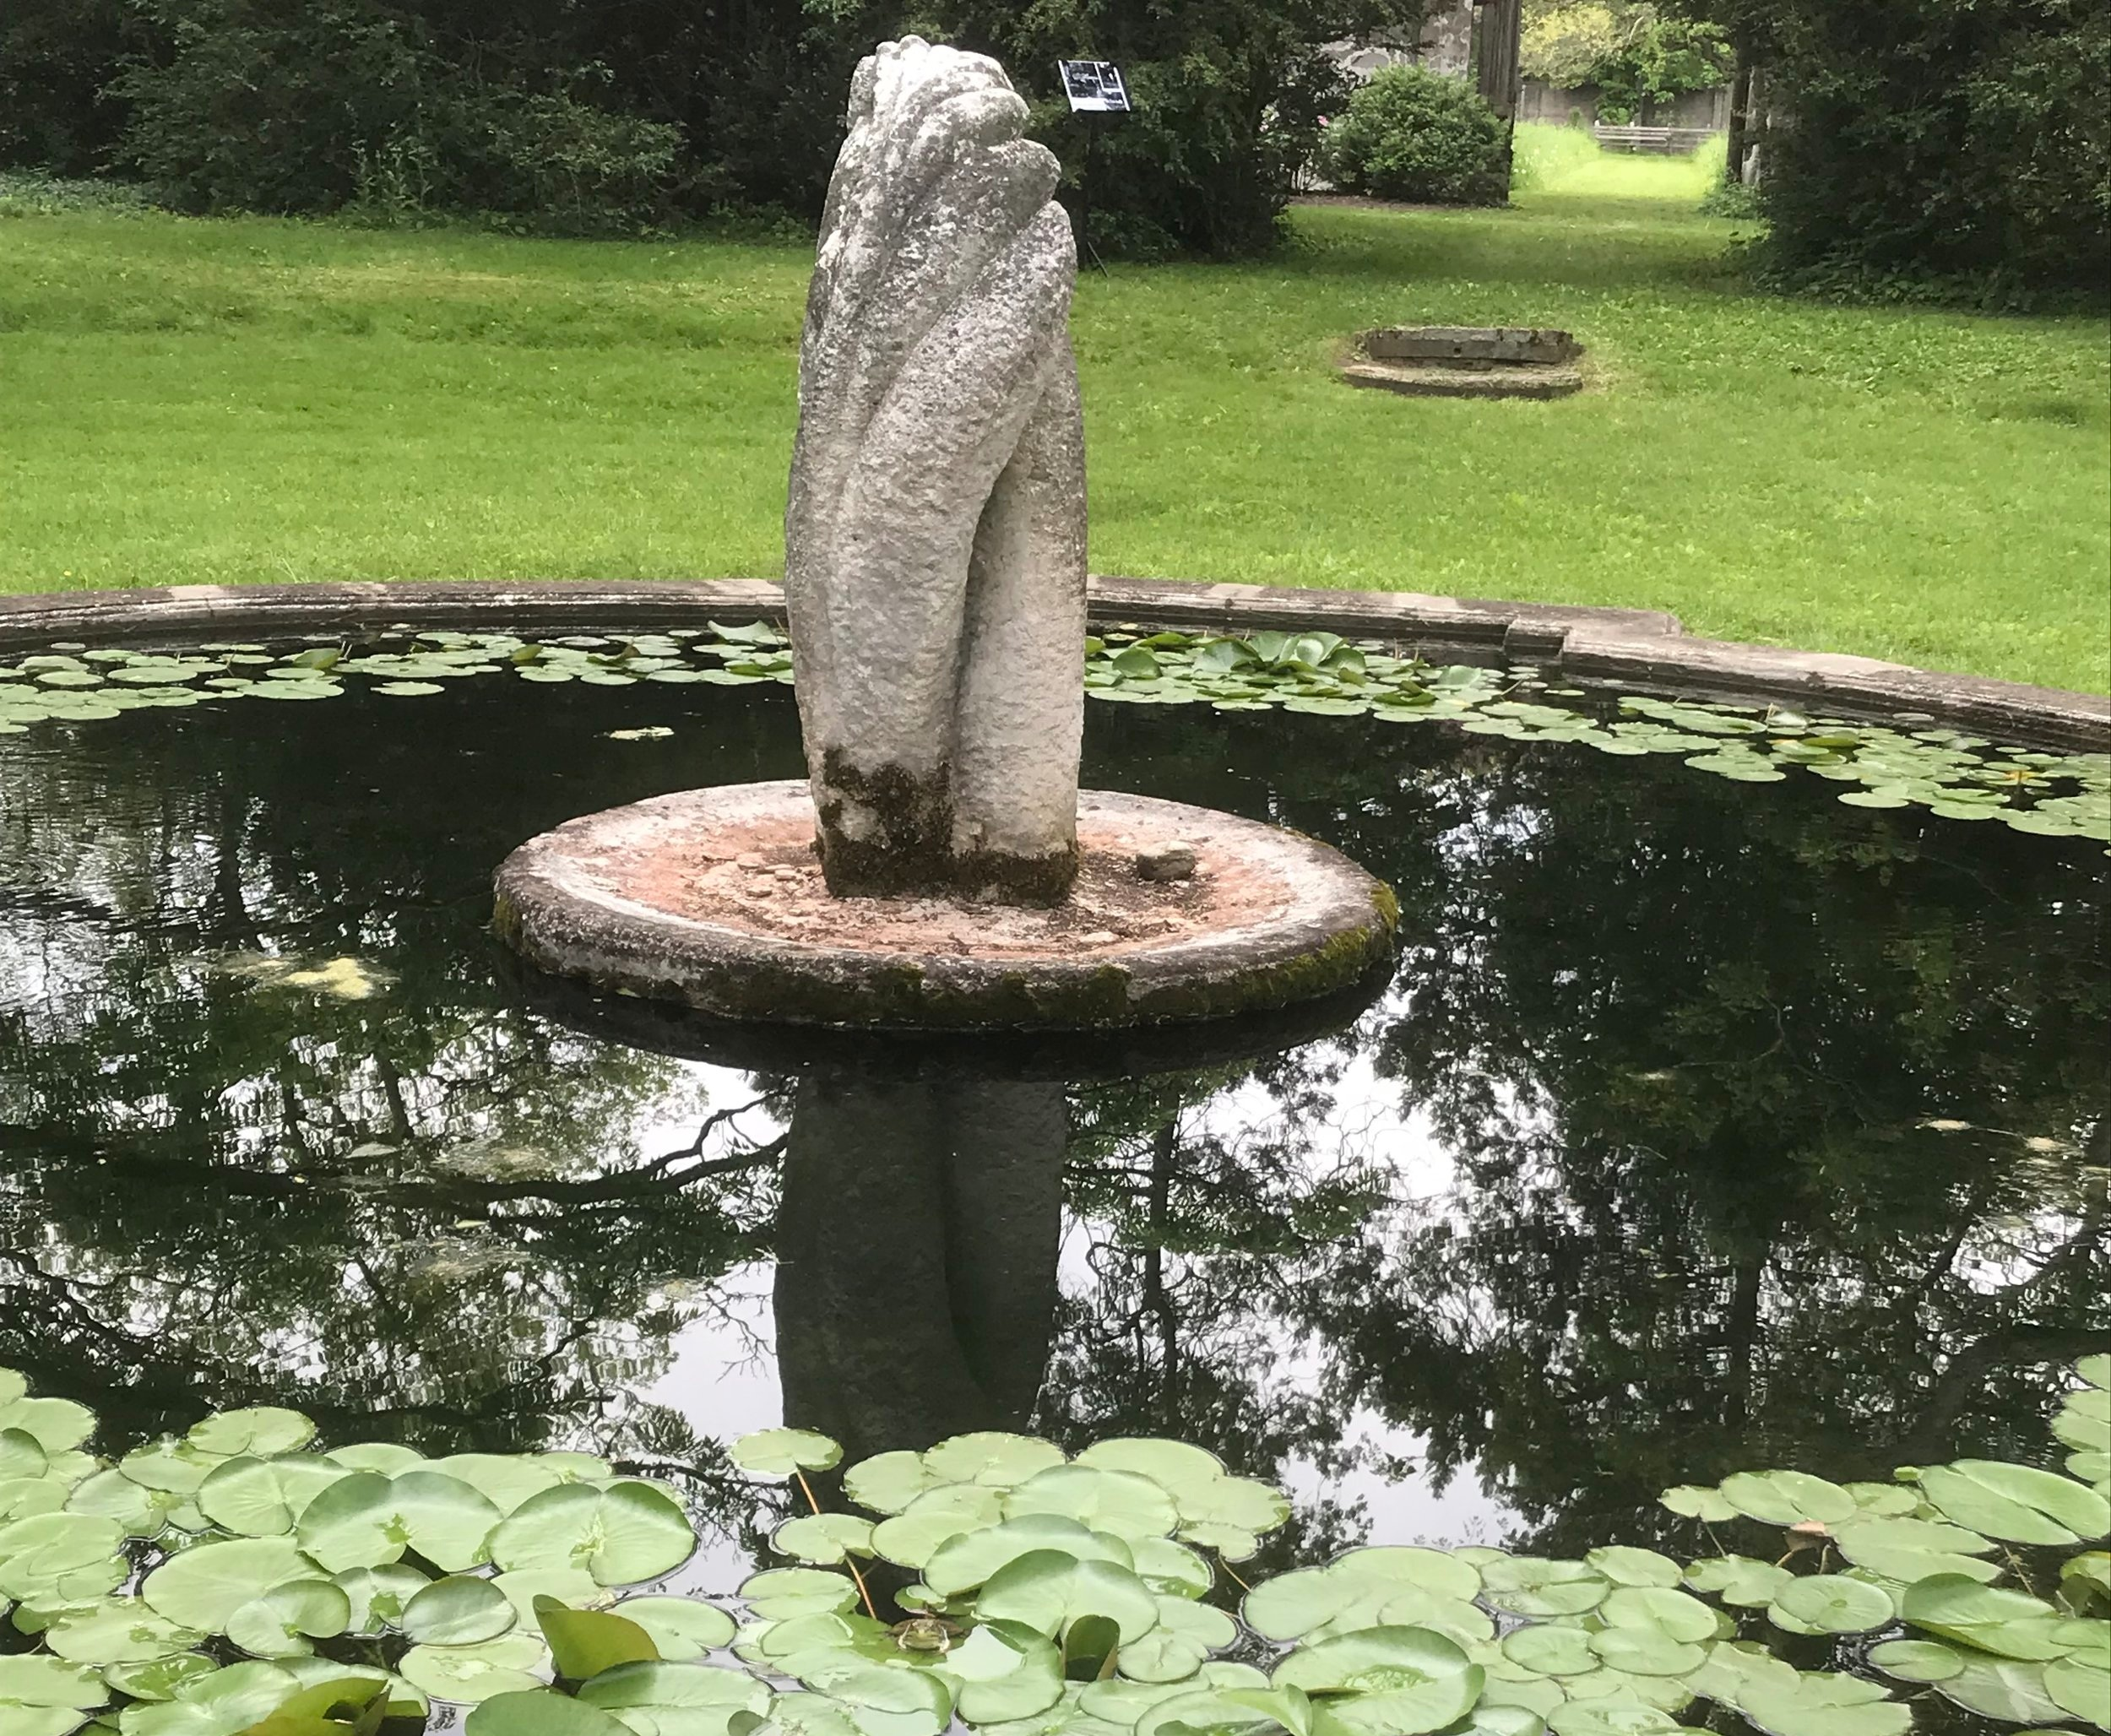 Reflective pool, Western New York (Gary Goodwin)